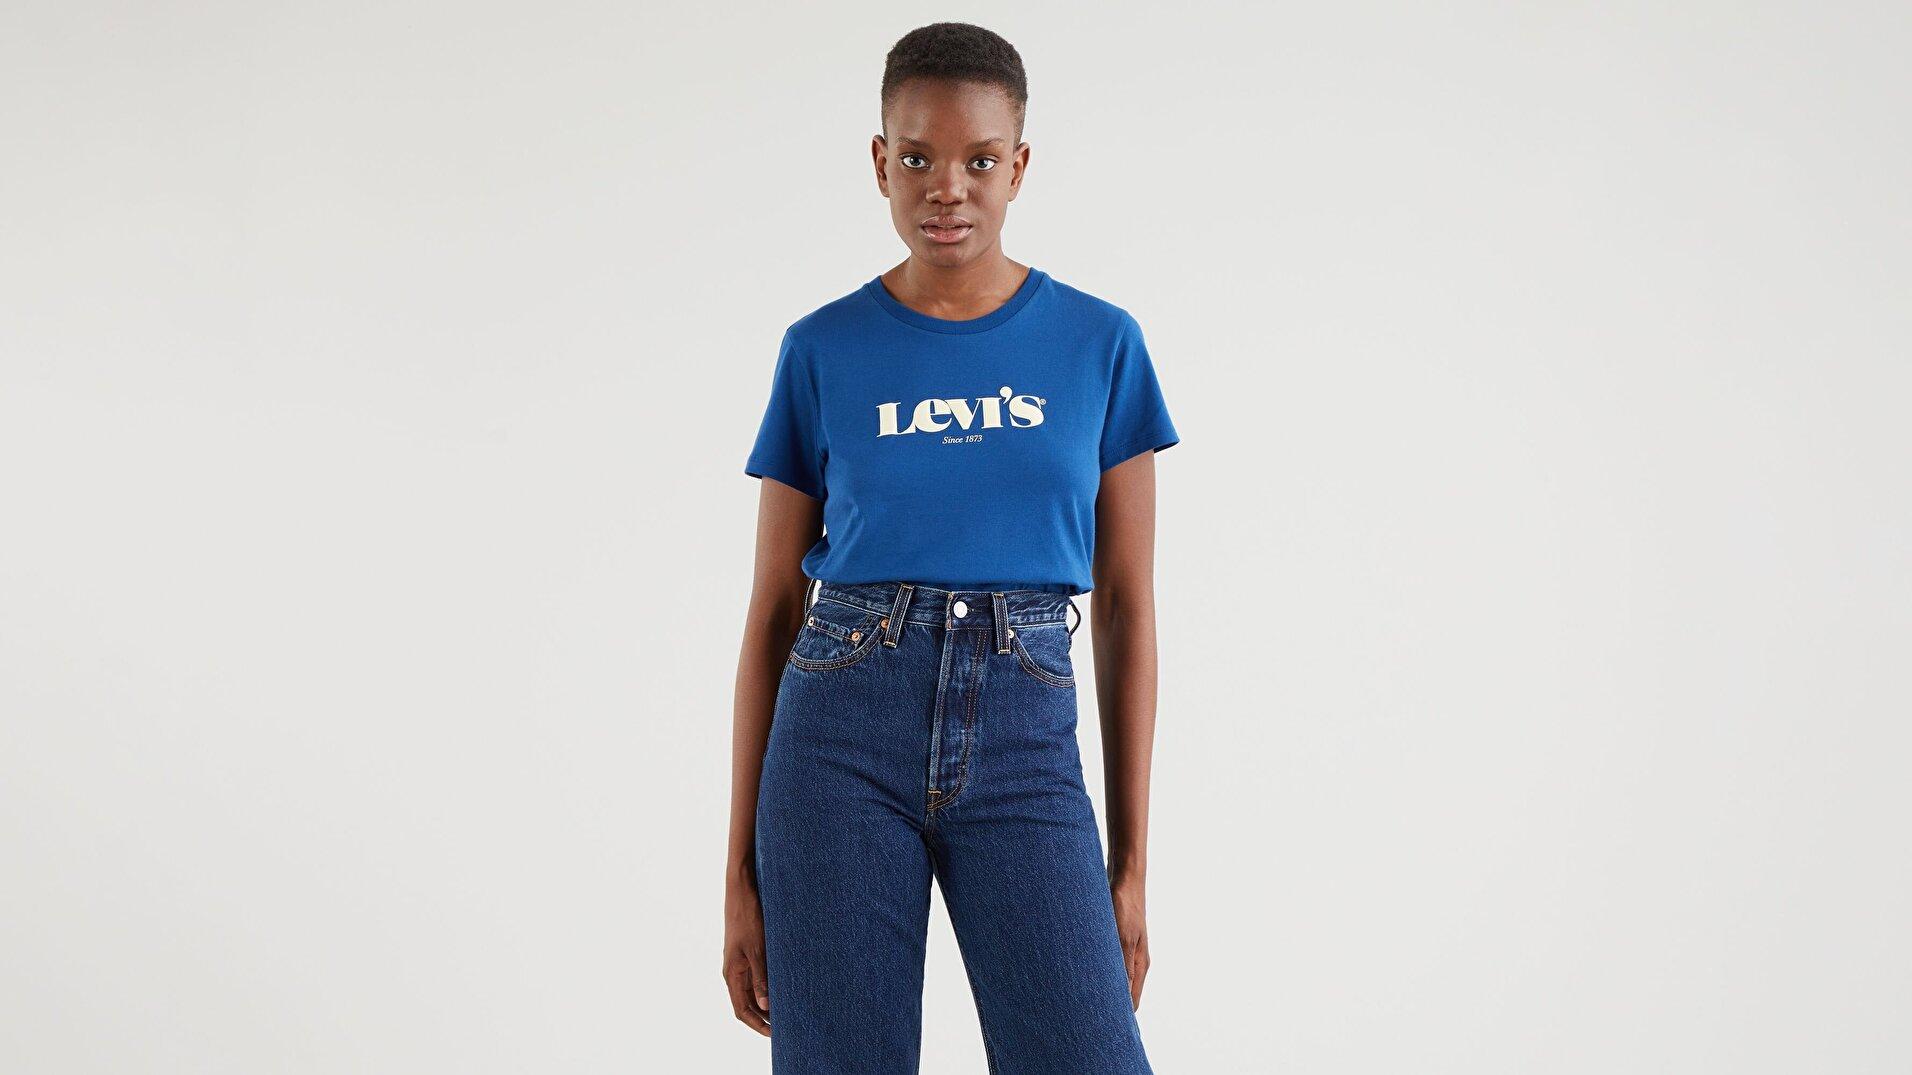 The Perfect Tee New Logo Estate Mavi Kadın Tişört